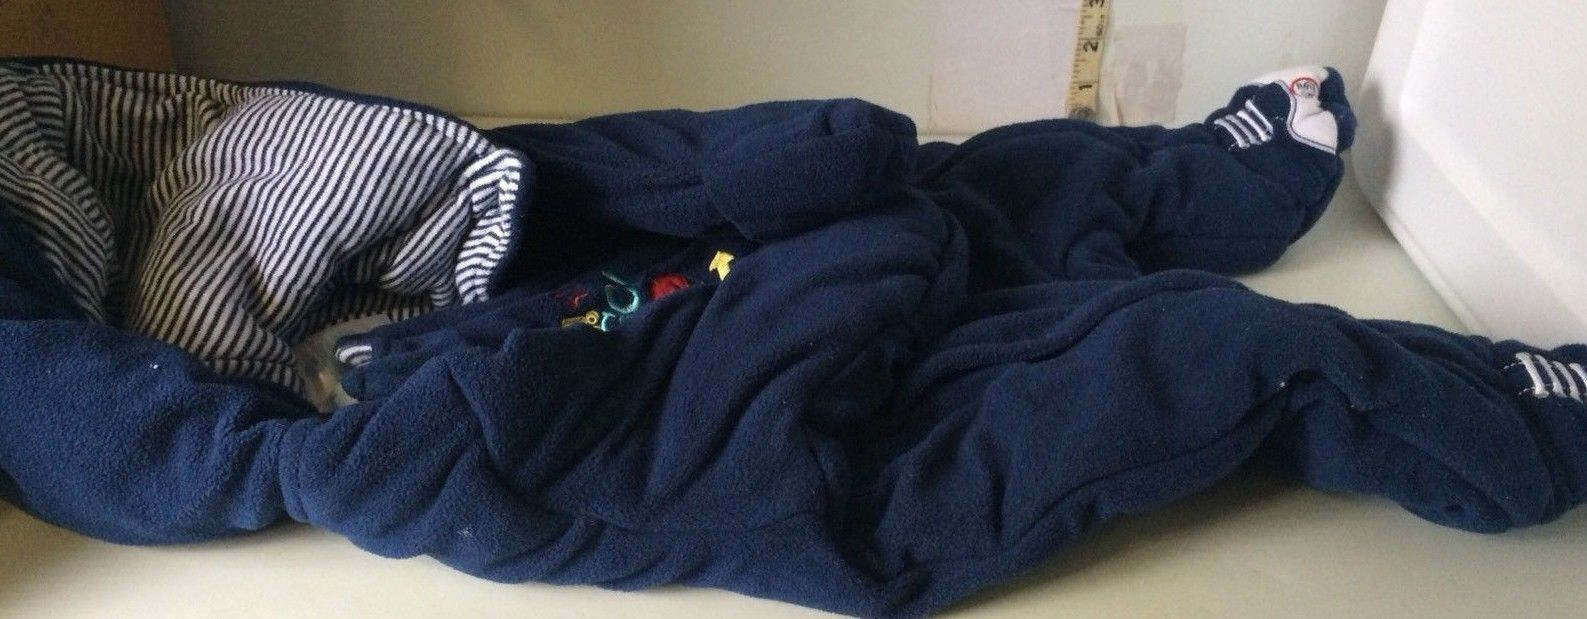 Disney Full Length footed Fleece 0-3 Months Blue 1 pc 95 Sleeper Hood (bin #109)